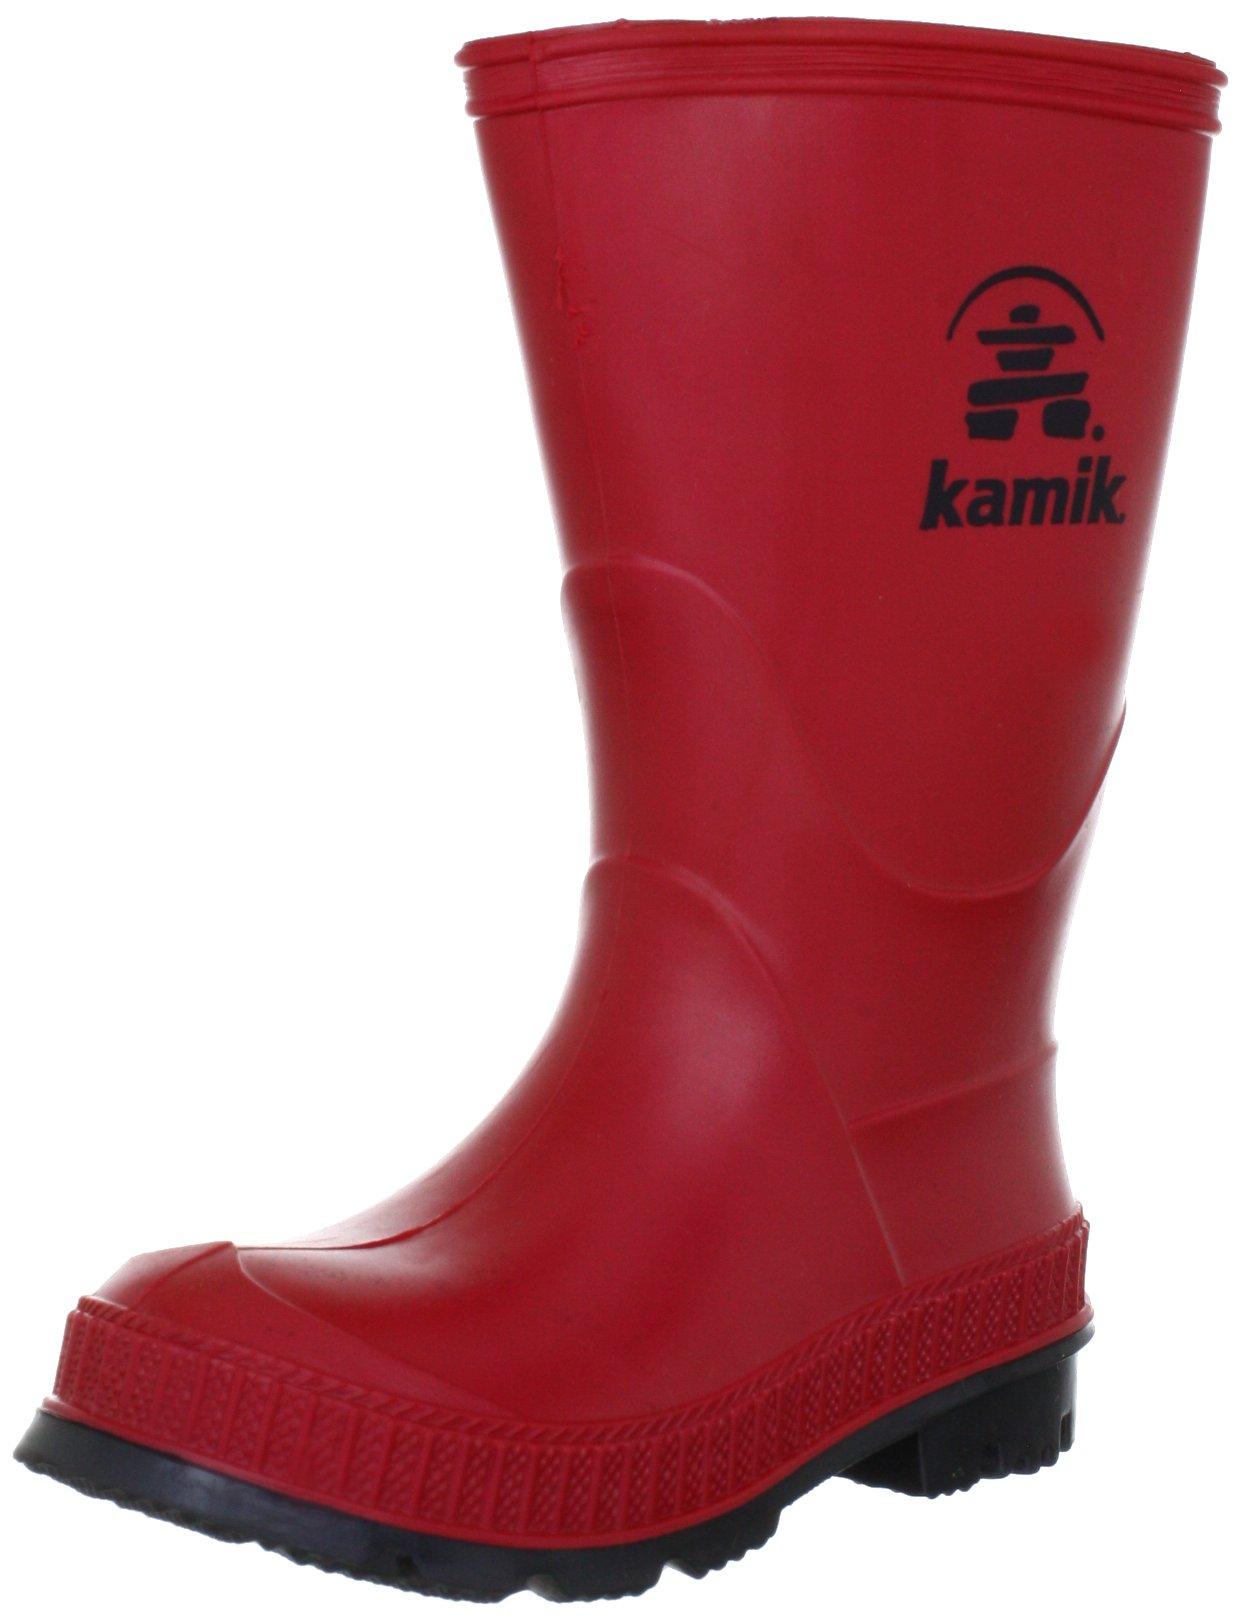 Kamik STOMP/YOUTH/PUR/6149 Rain Boot Red,12 M US Little Kid